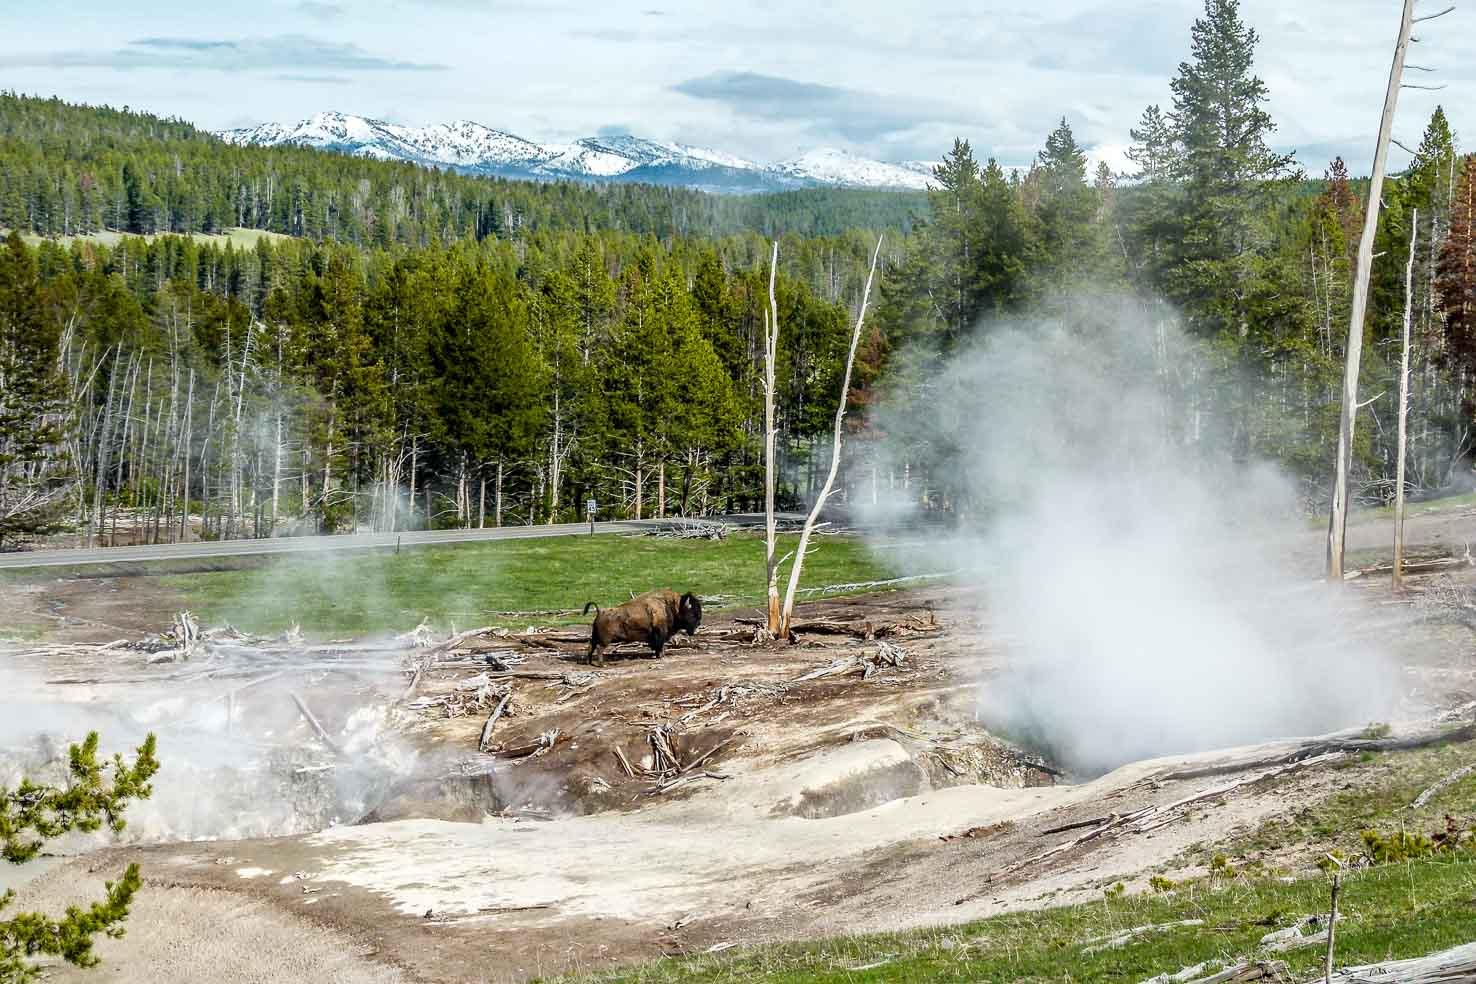 yellowstone national park descriptive essay